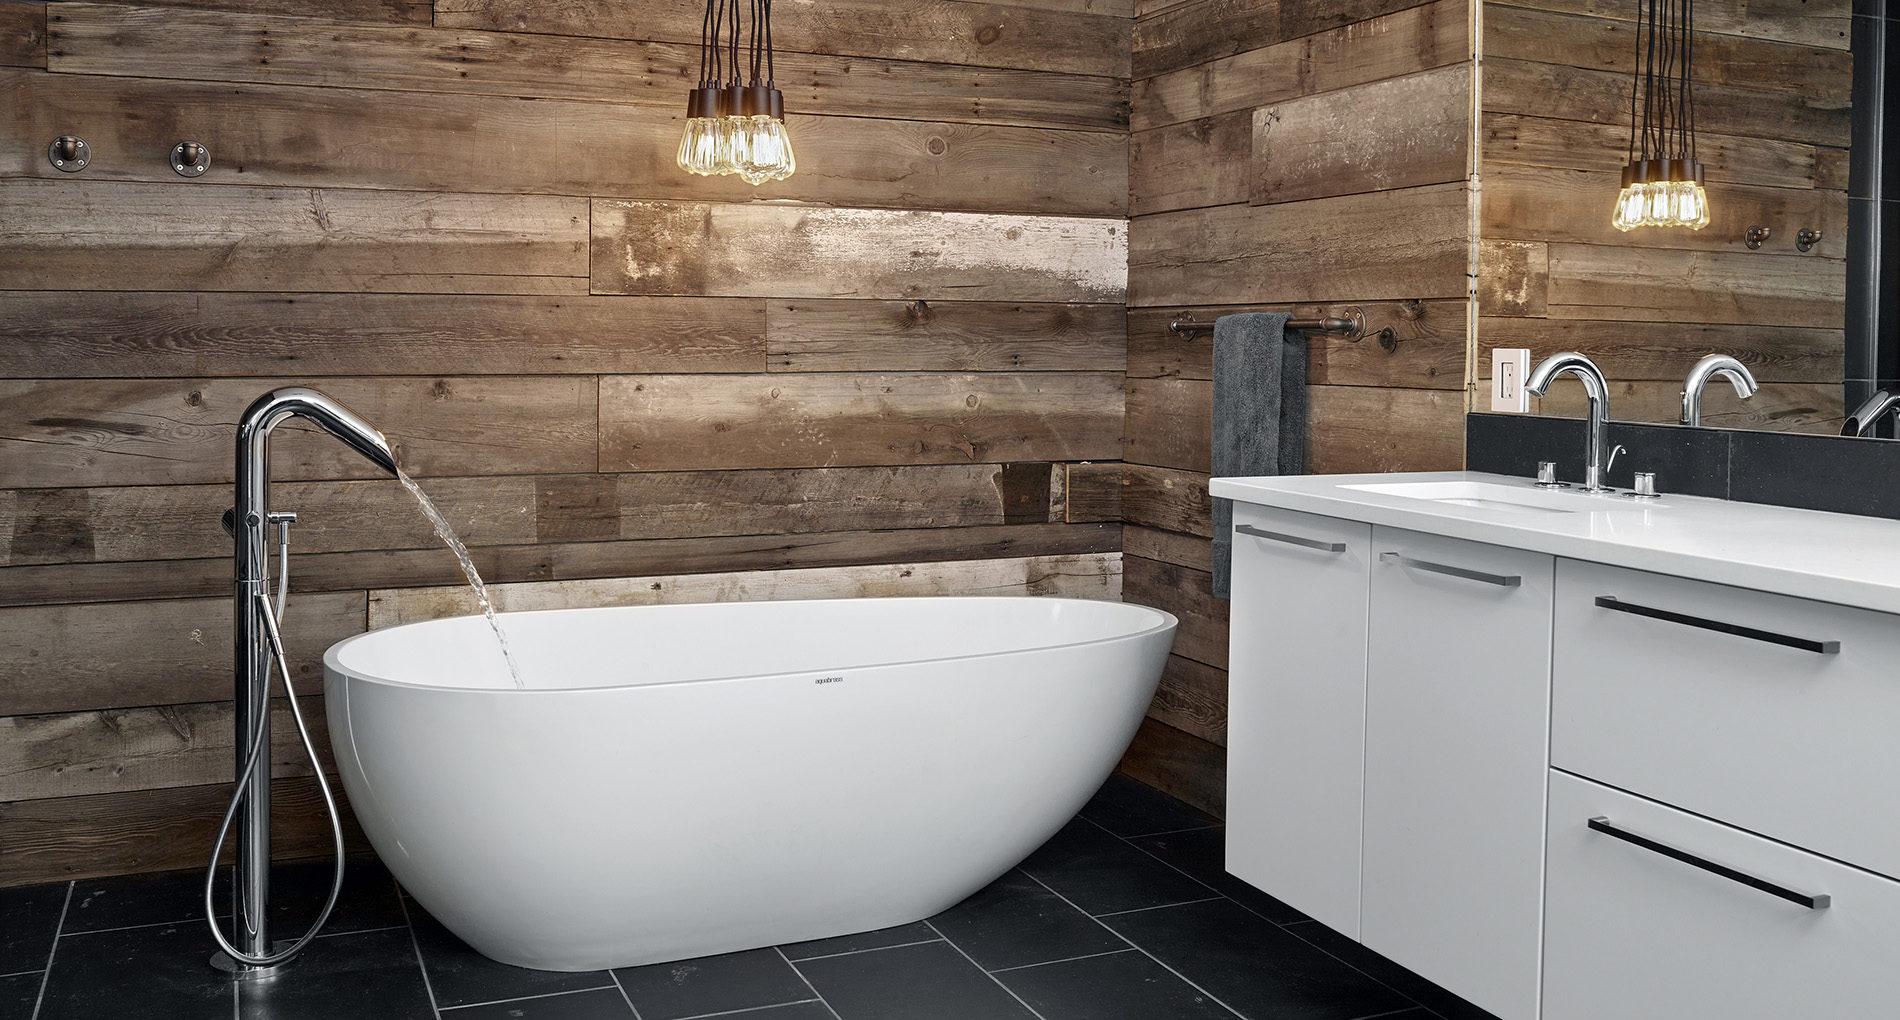 Bathroom Renovation Tricities Bell Slider